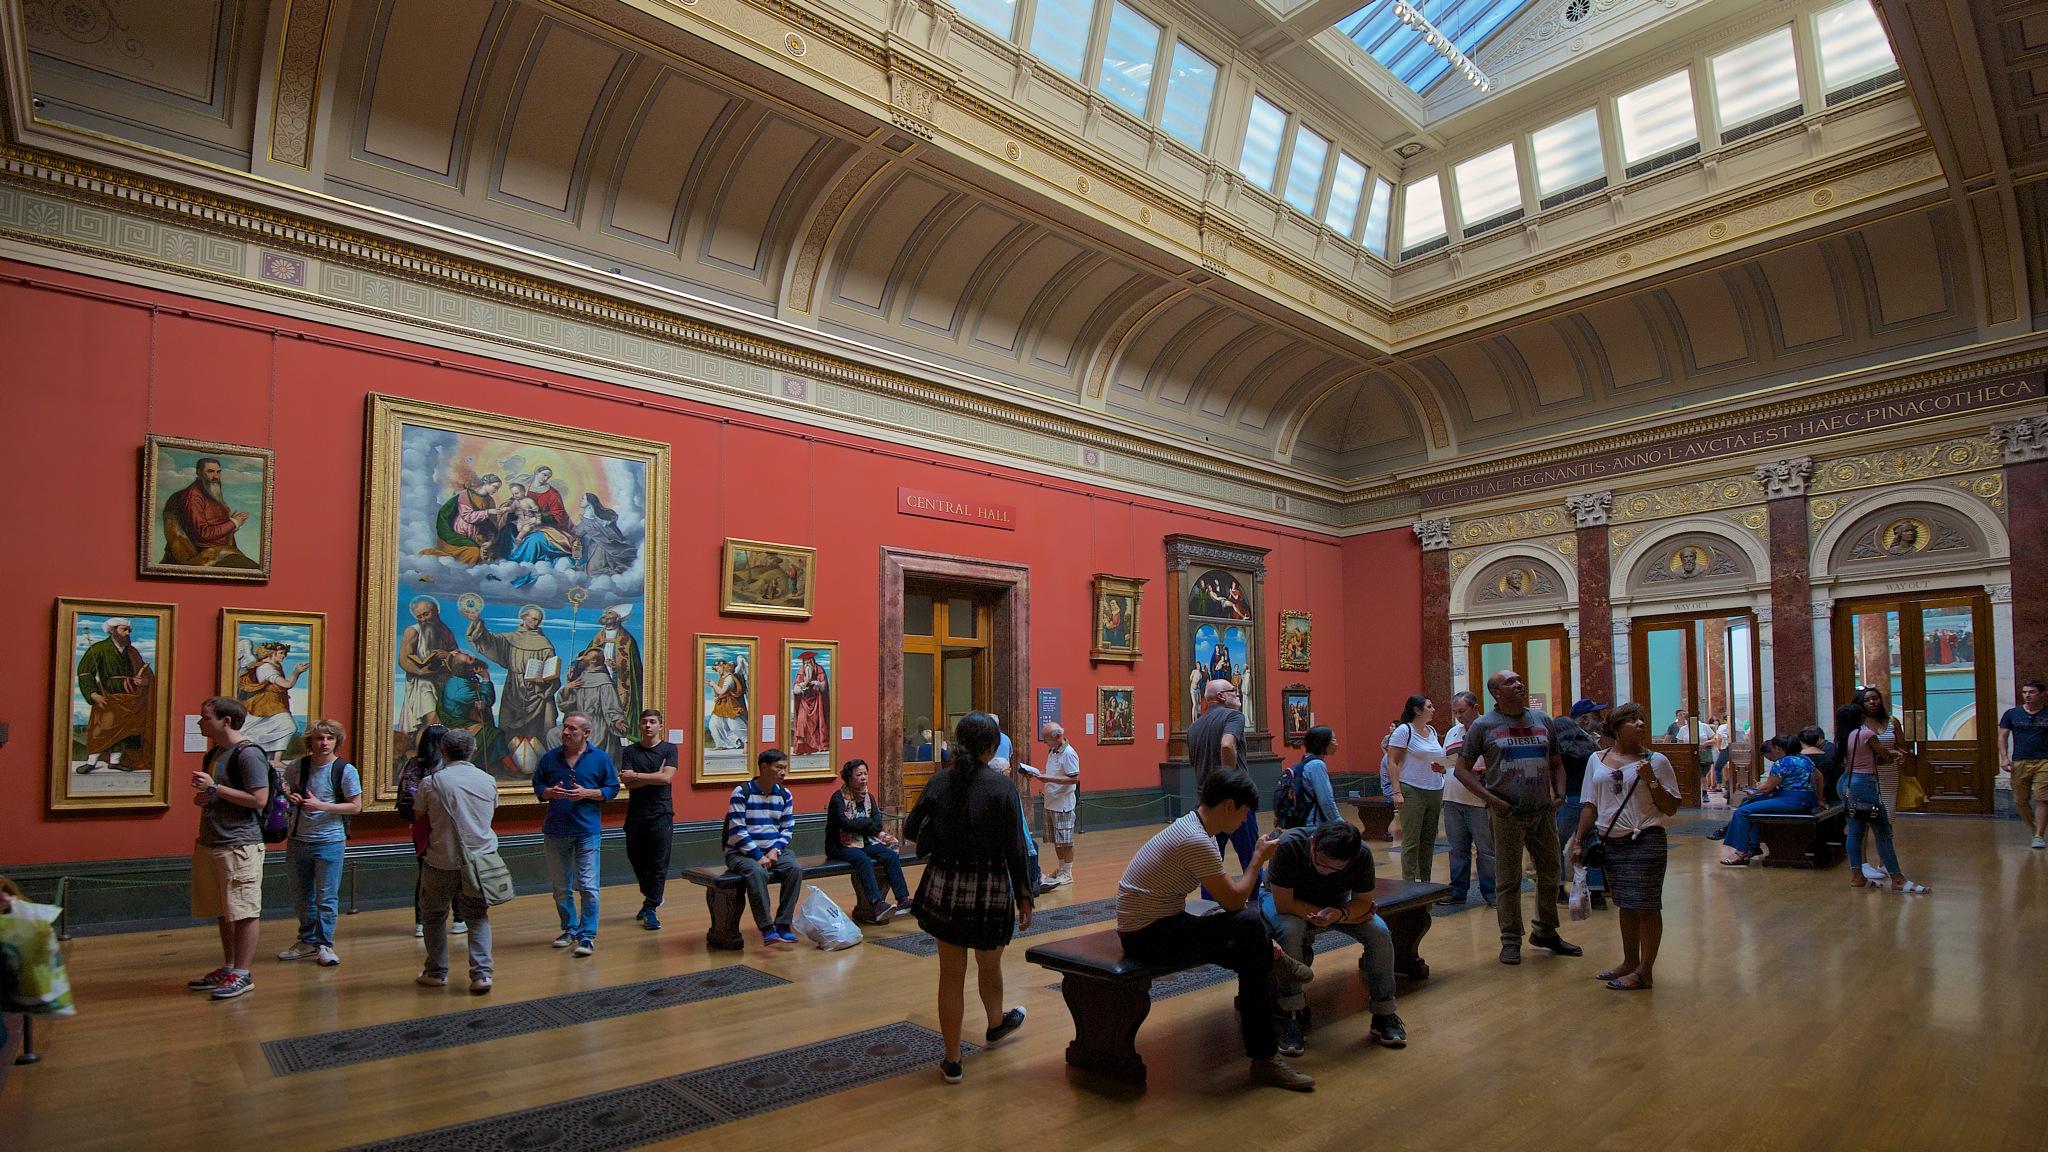 Central Hall - London Art Gallery by EmanuelPapamanolis